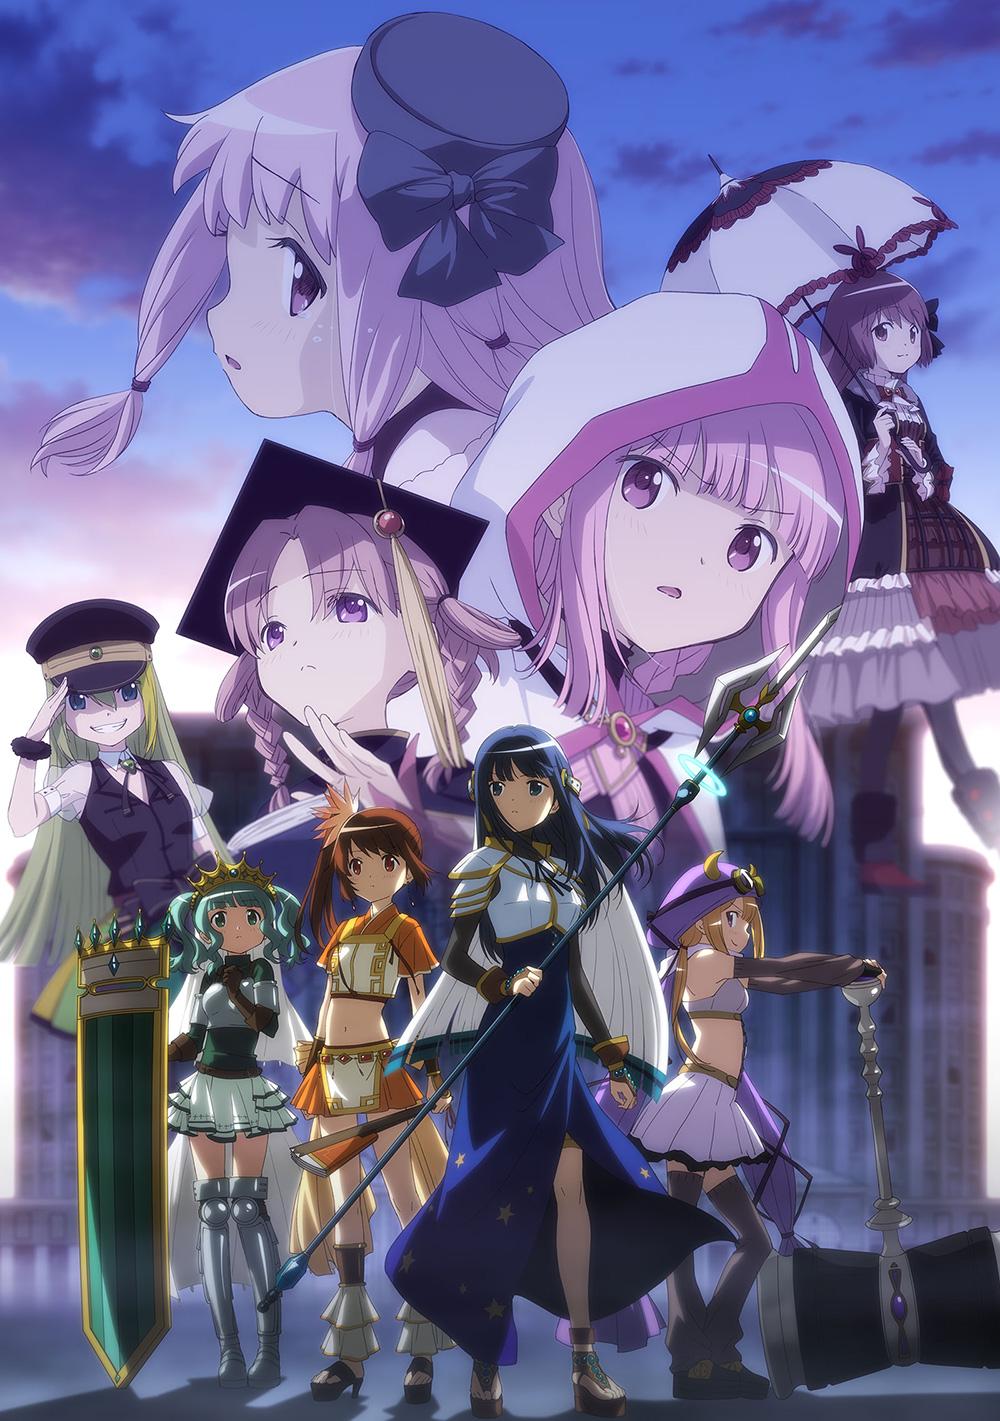 Magia-Record-Mahou-Shoujo-Madoka-Magica-Gaiden-Season-2-Visual